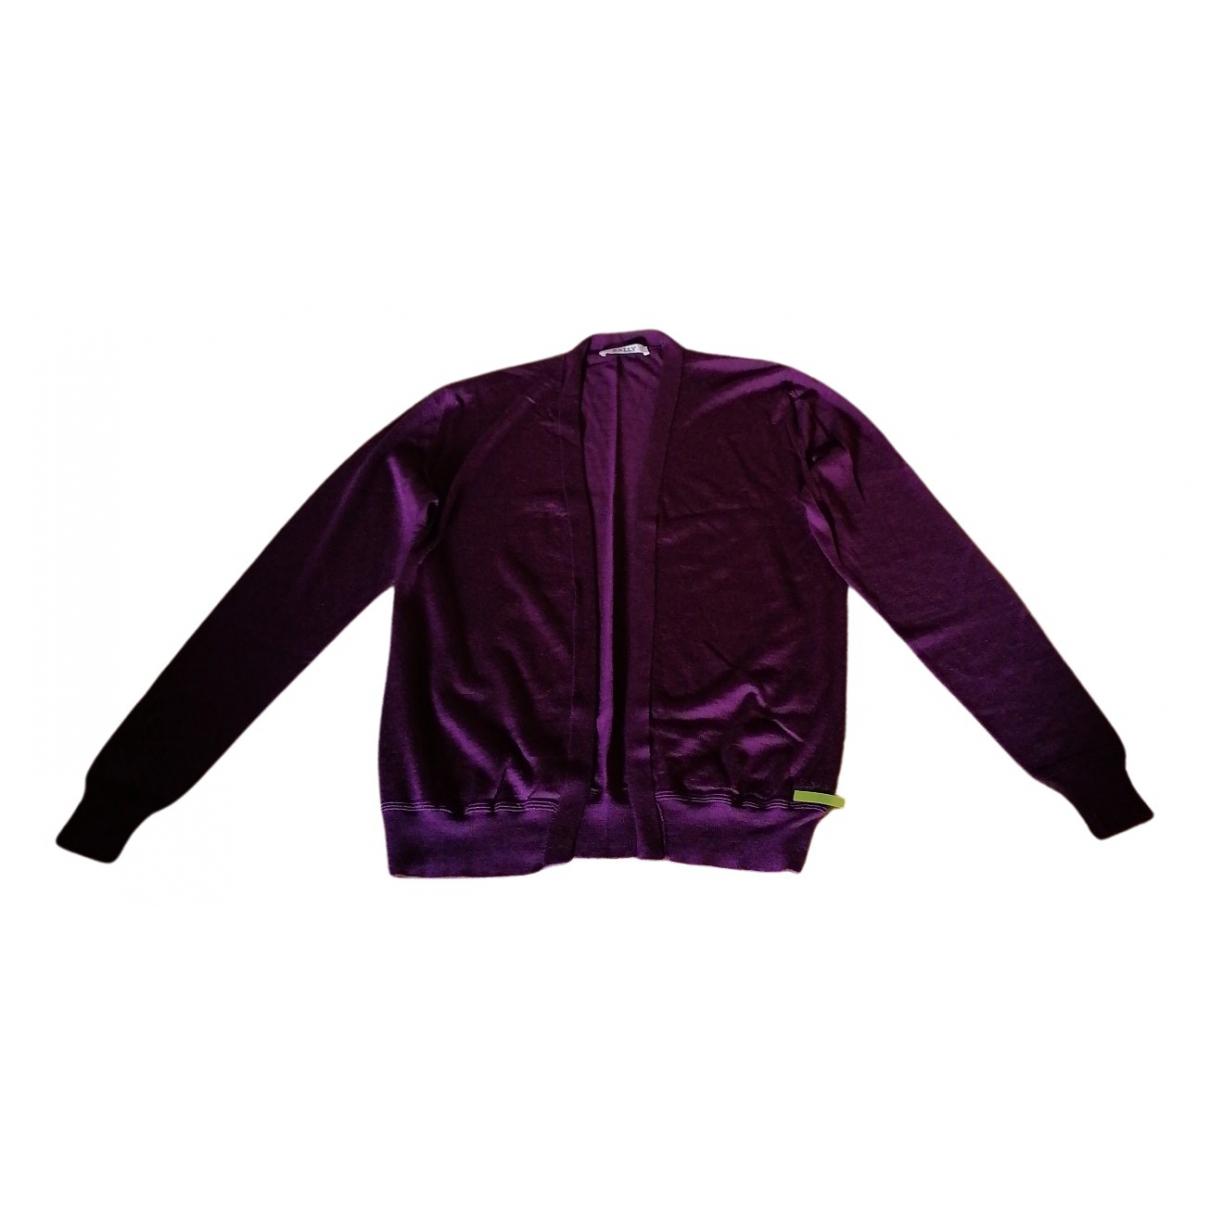 Bally - Pull   pour femme en soie - violet